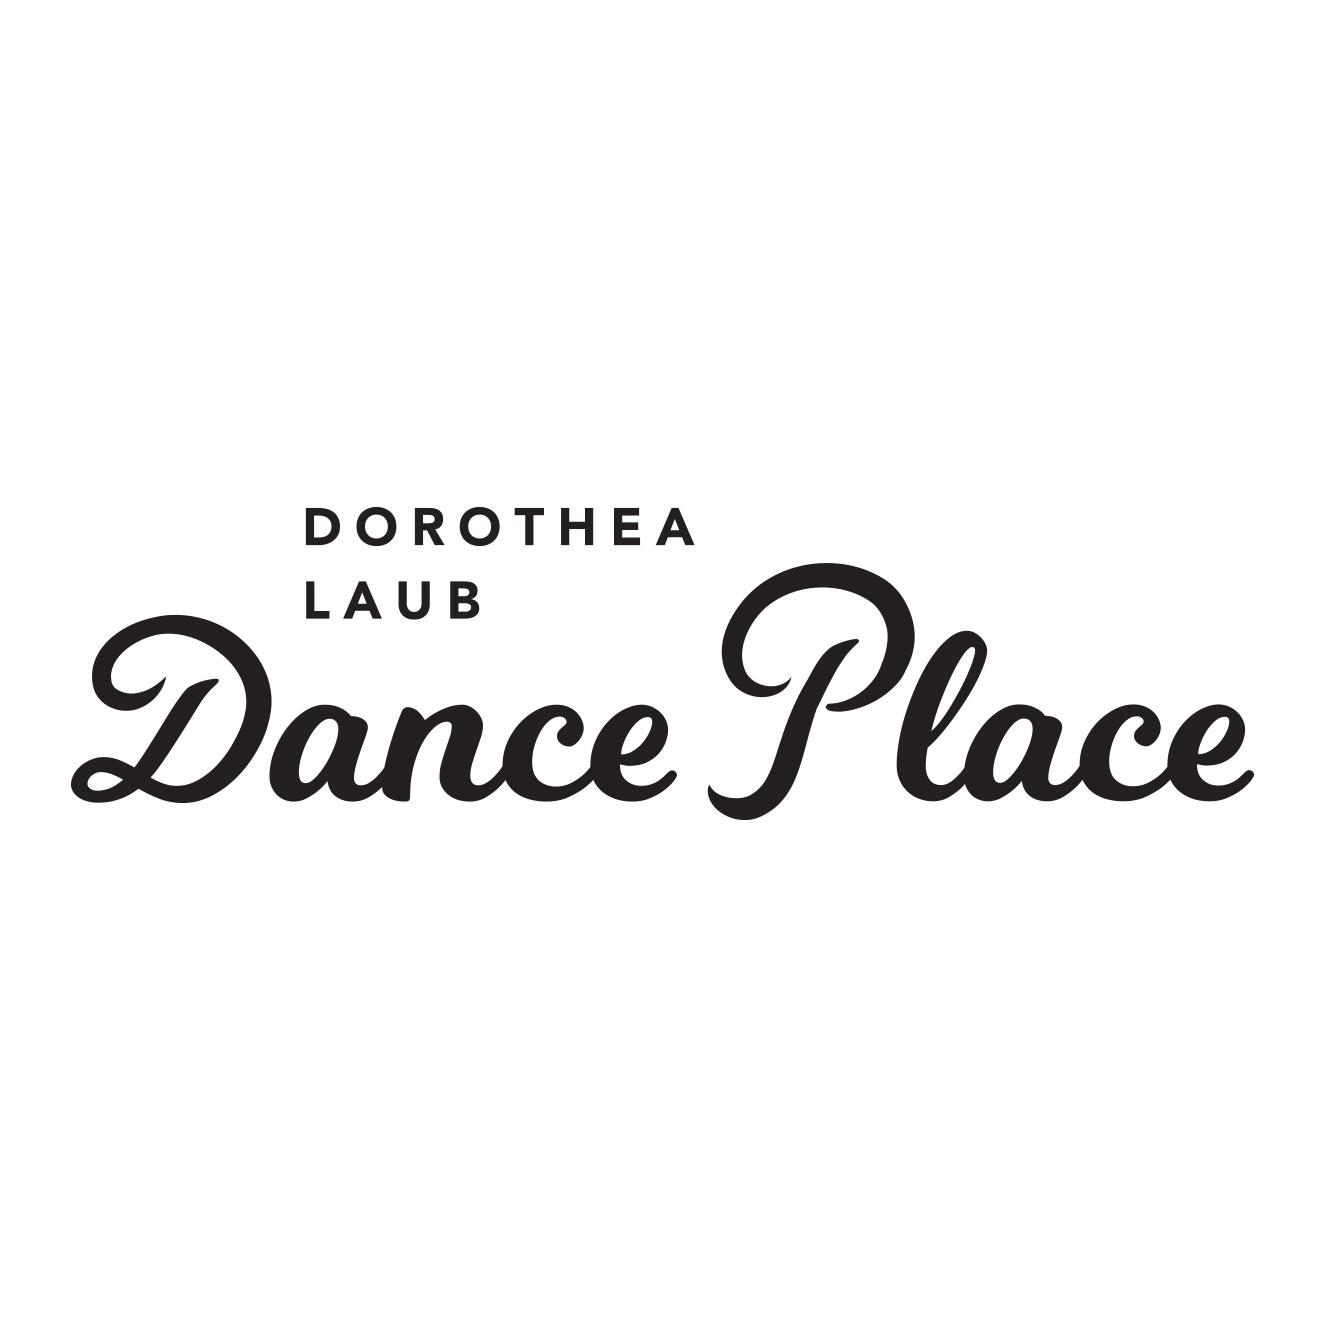 Dorothea Laub Dance Place horizontal logo